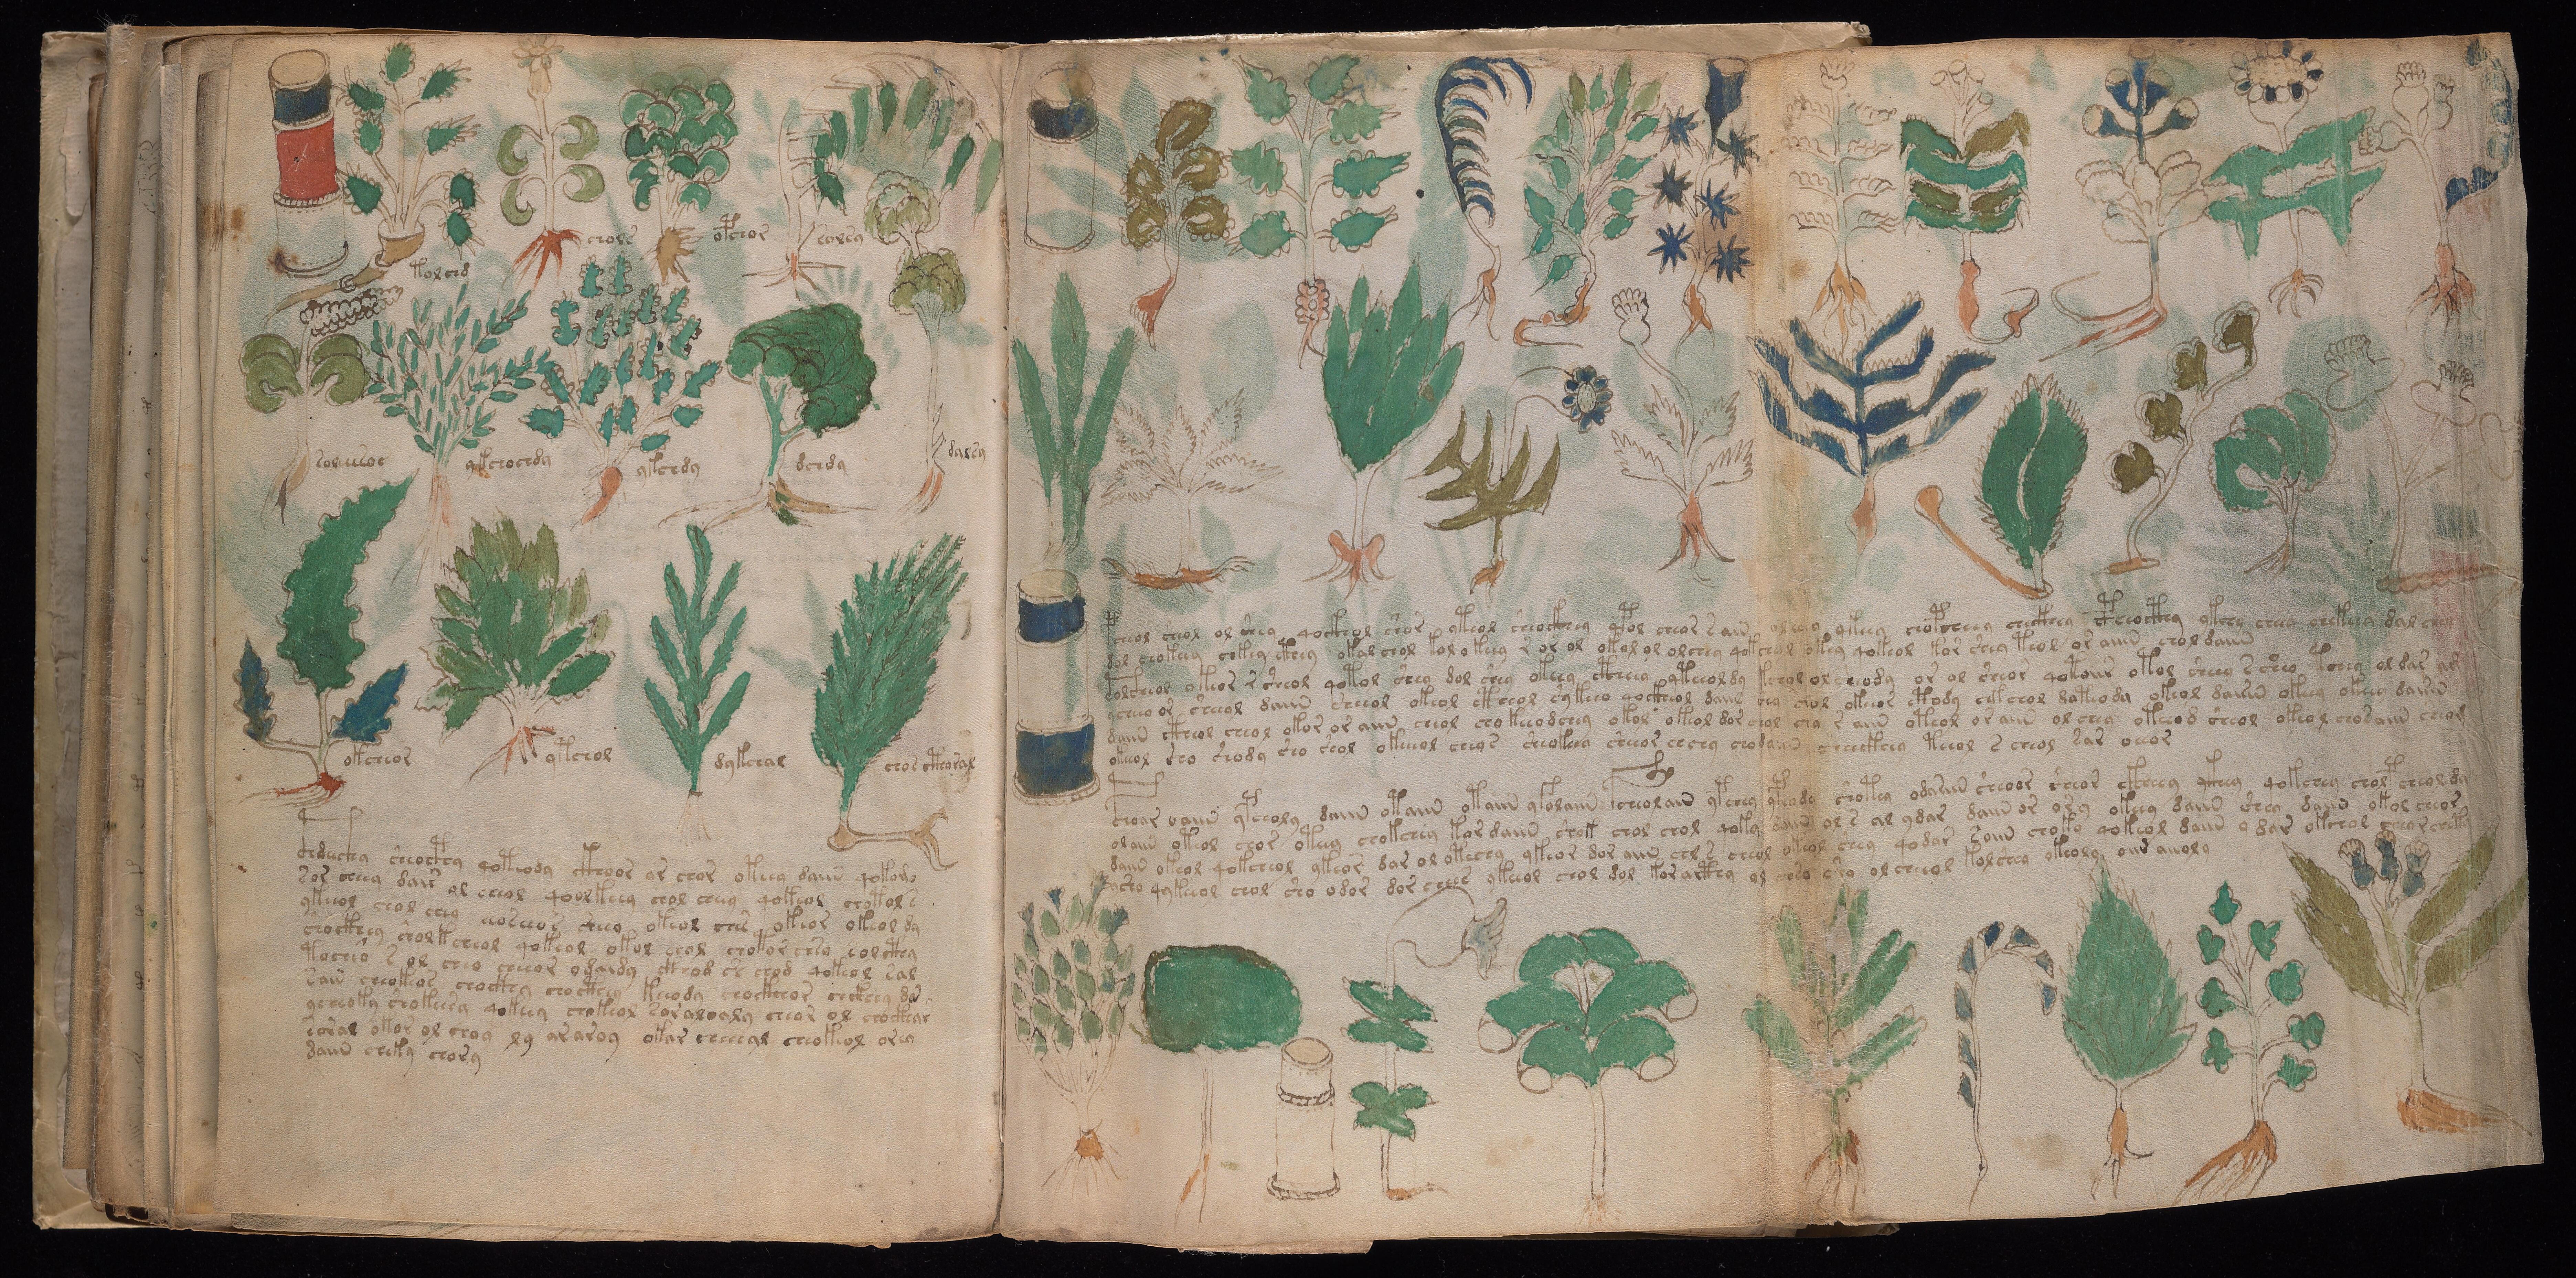 Illuminating the Illuminated: A First Look at the Voynich Manuscript